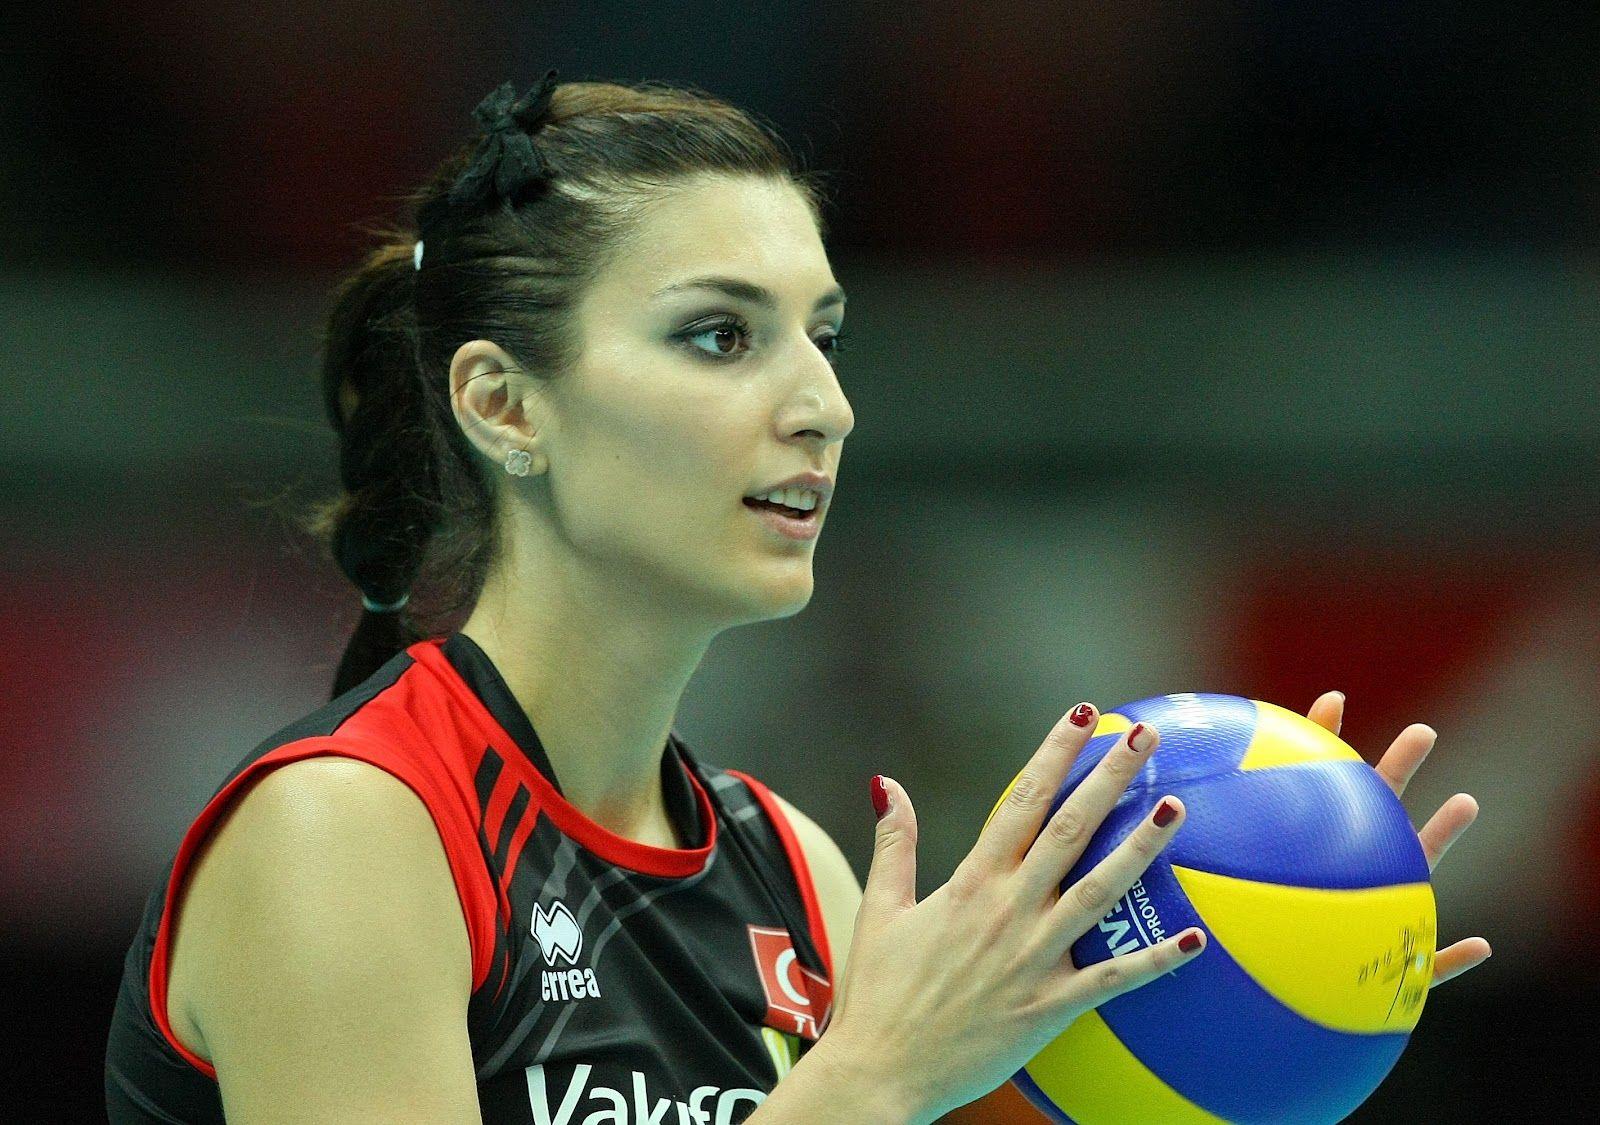 Neslihan Darnel Turkish Volleyball Player Volleyball Players Volleyball Images Warrior Woman